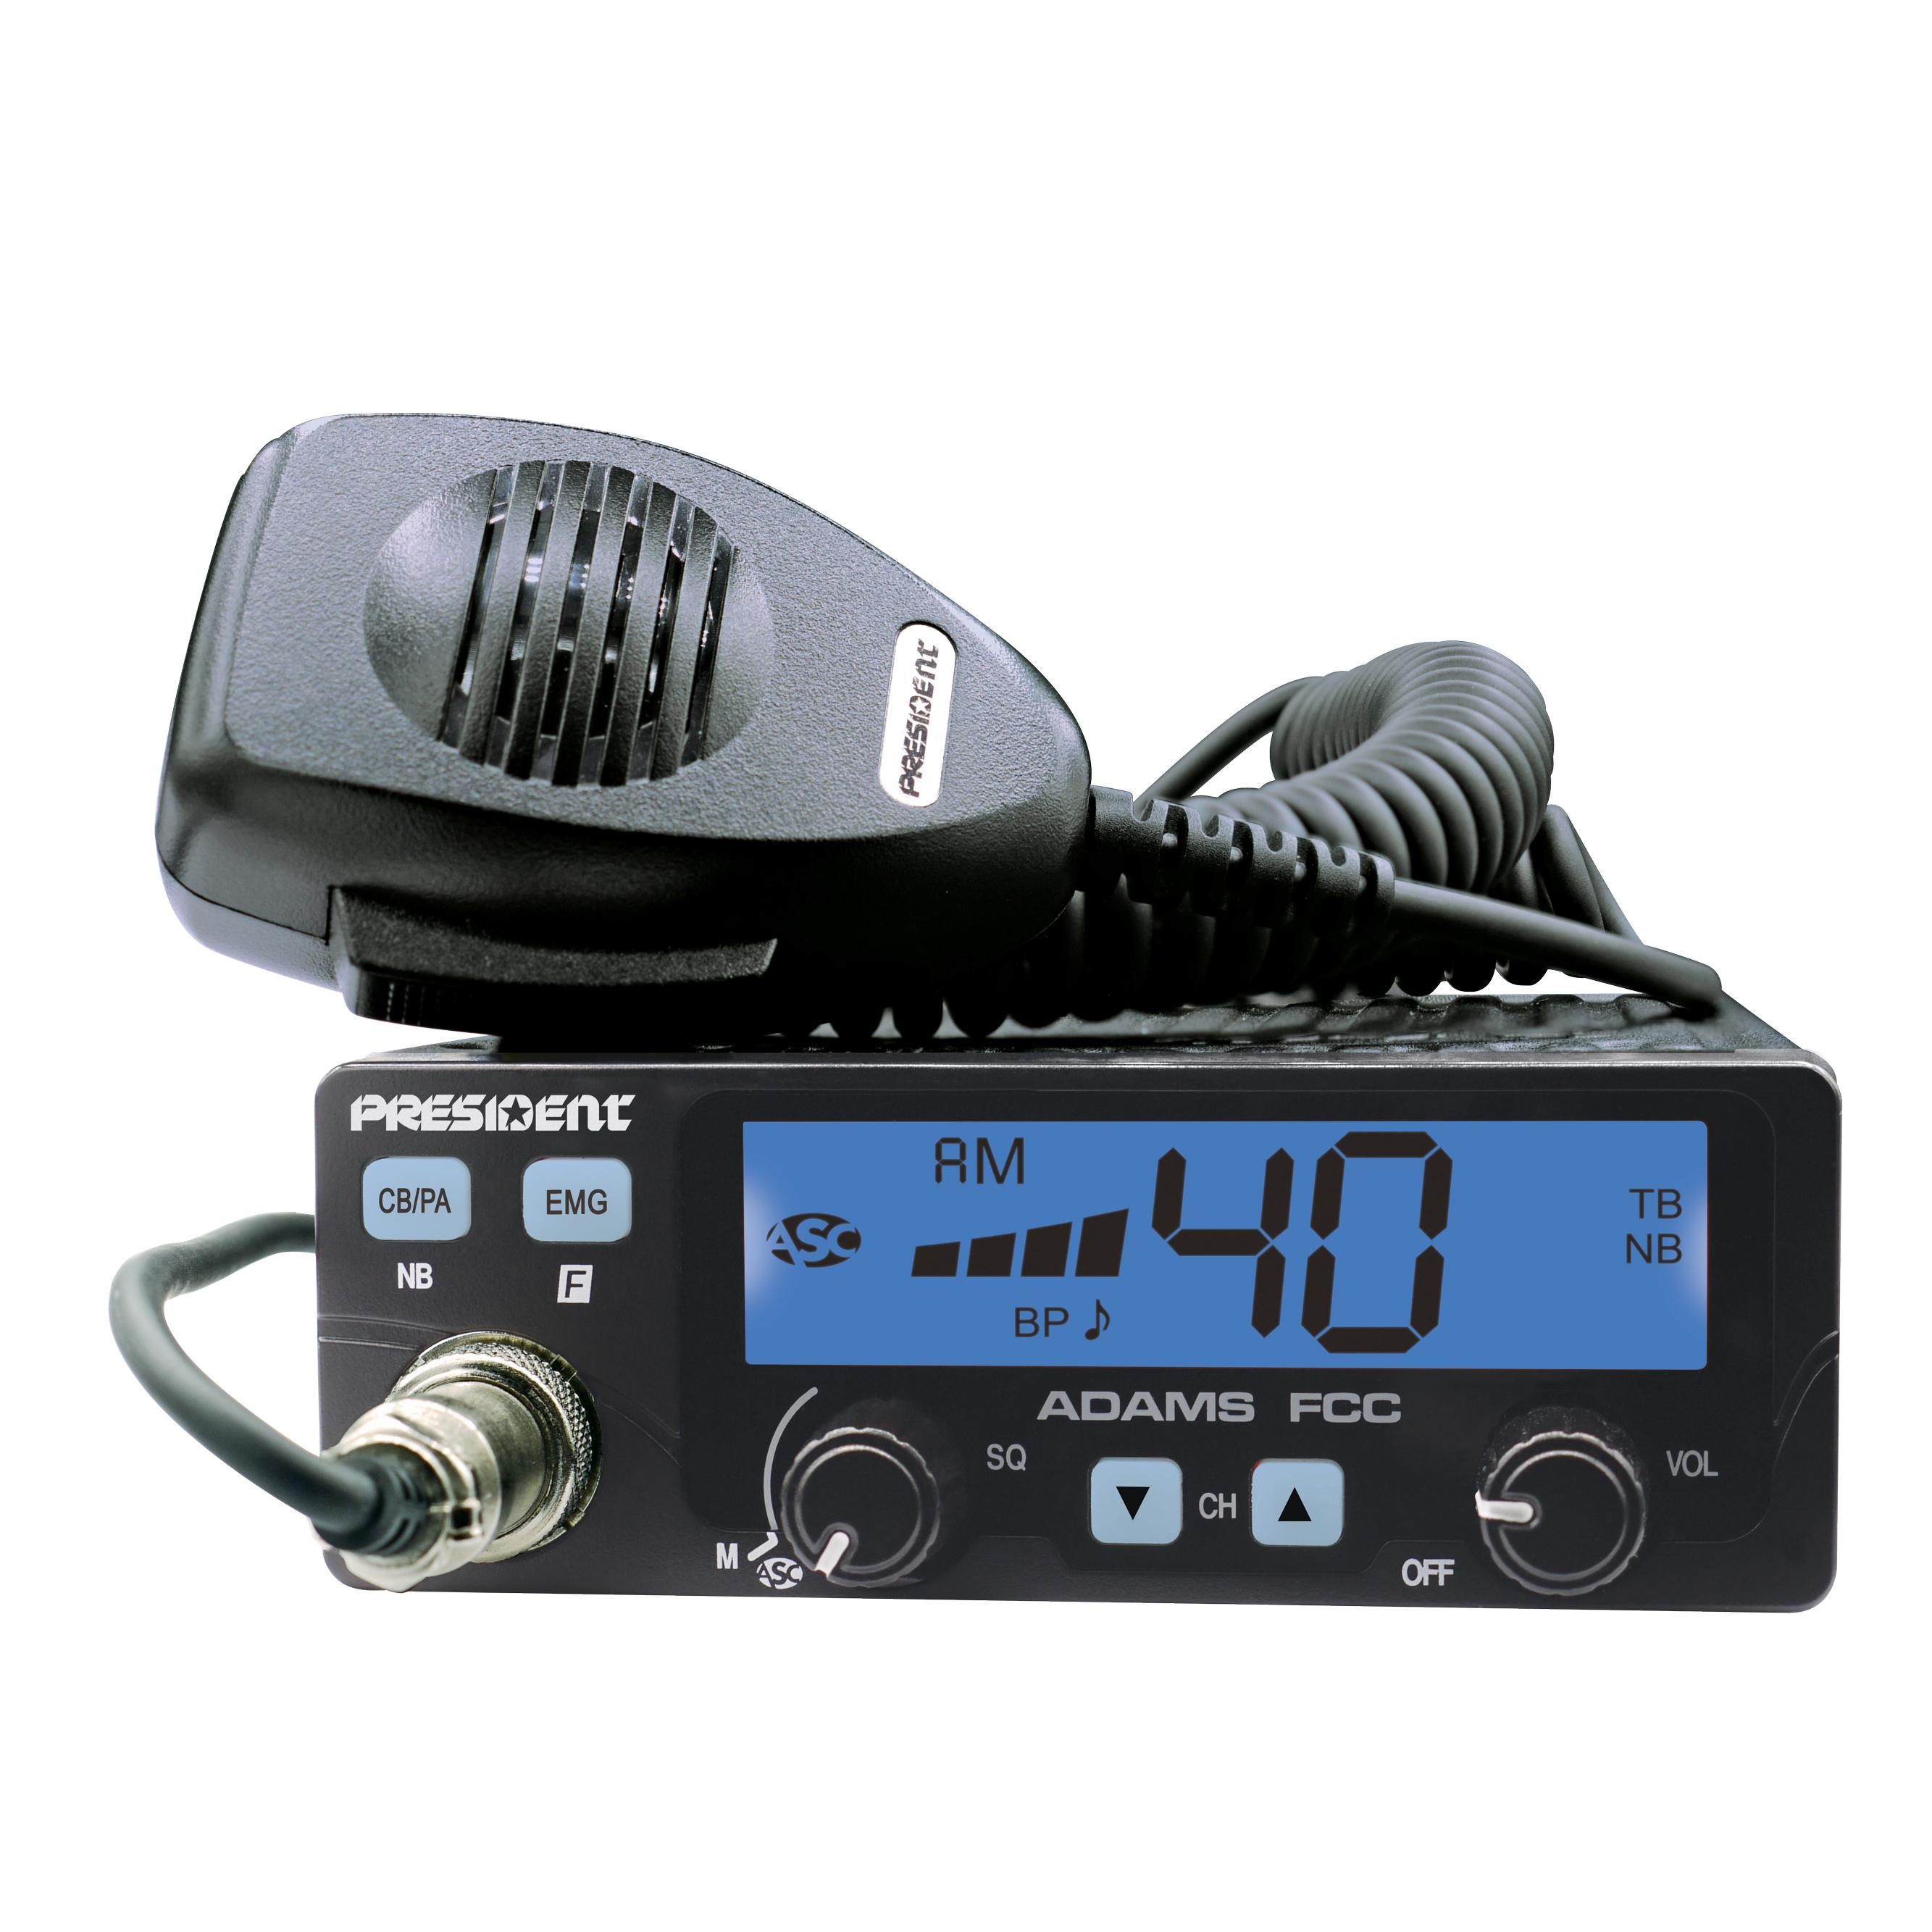 ADAMS - President 40 Channel CB Radio with Talkback and Color Display OptionsADAMS - President 40 Channel CB Radio with Talkback and Color Display Options